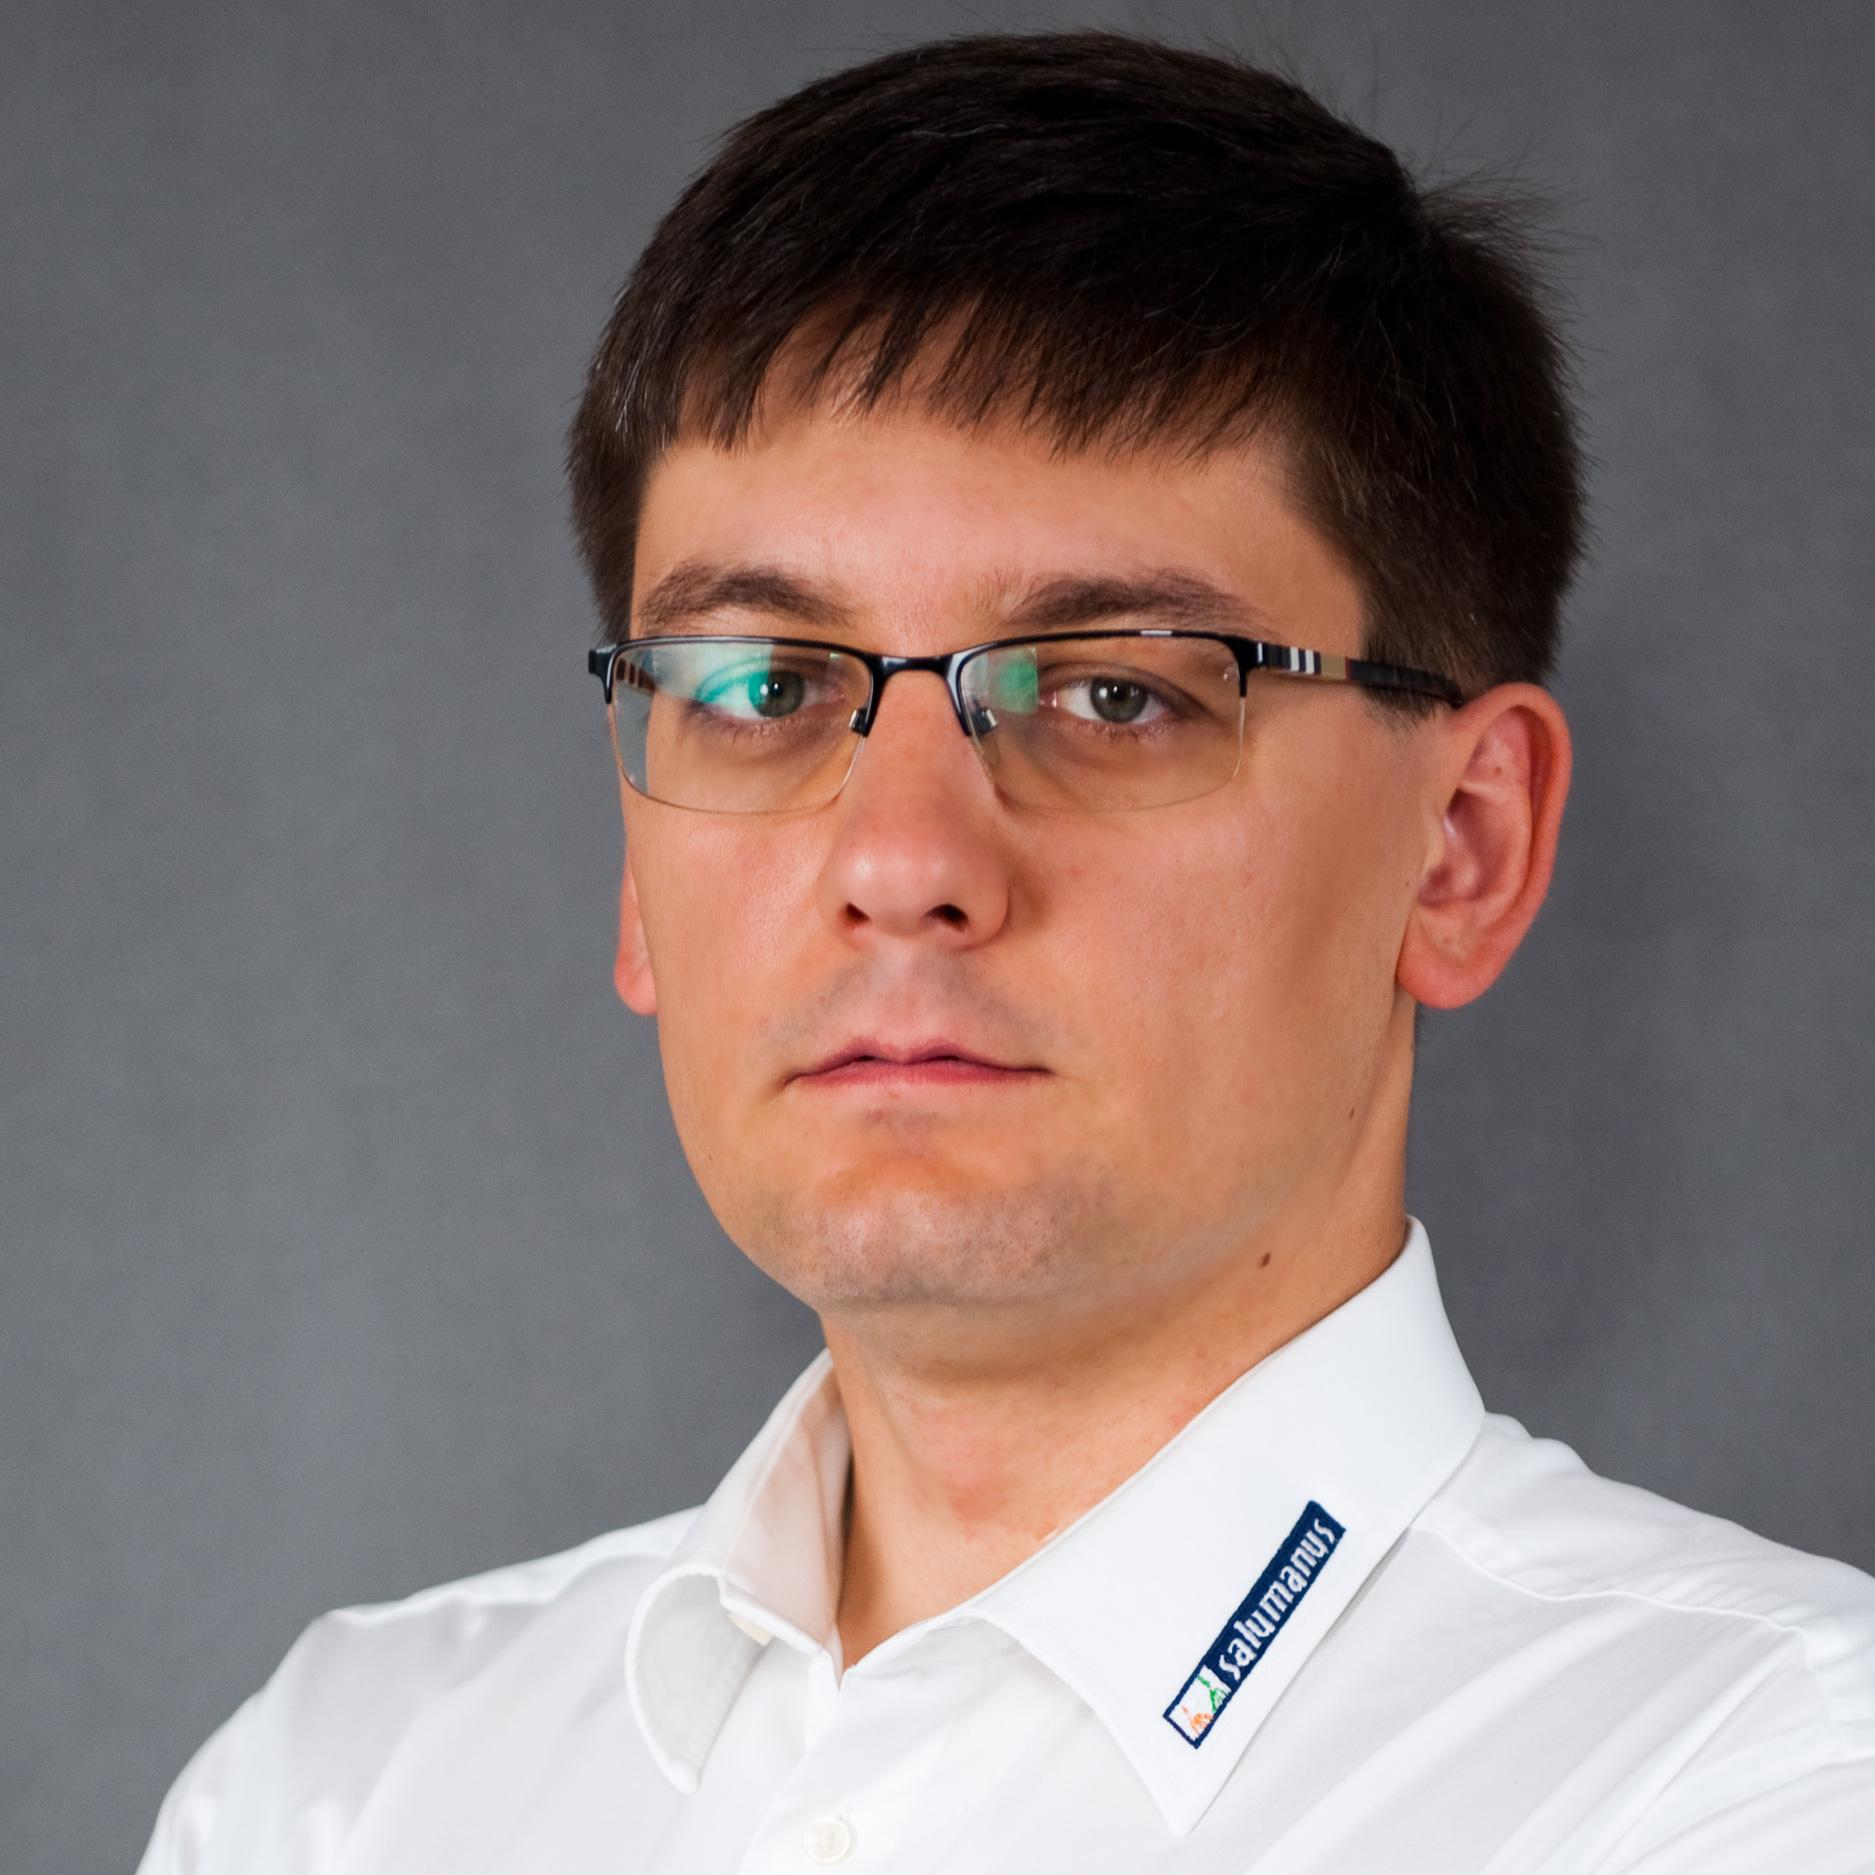 Marcin Bała